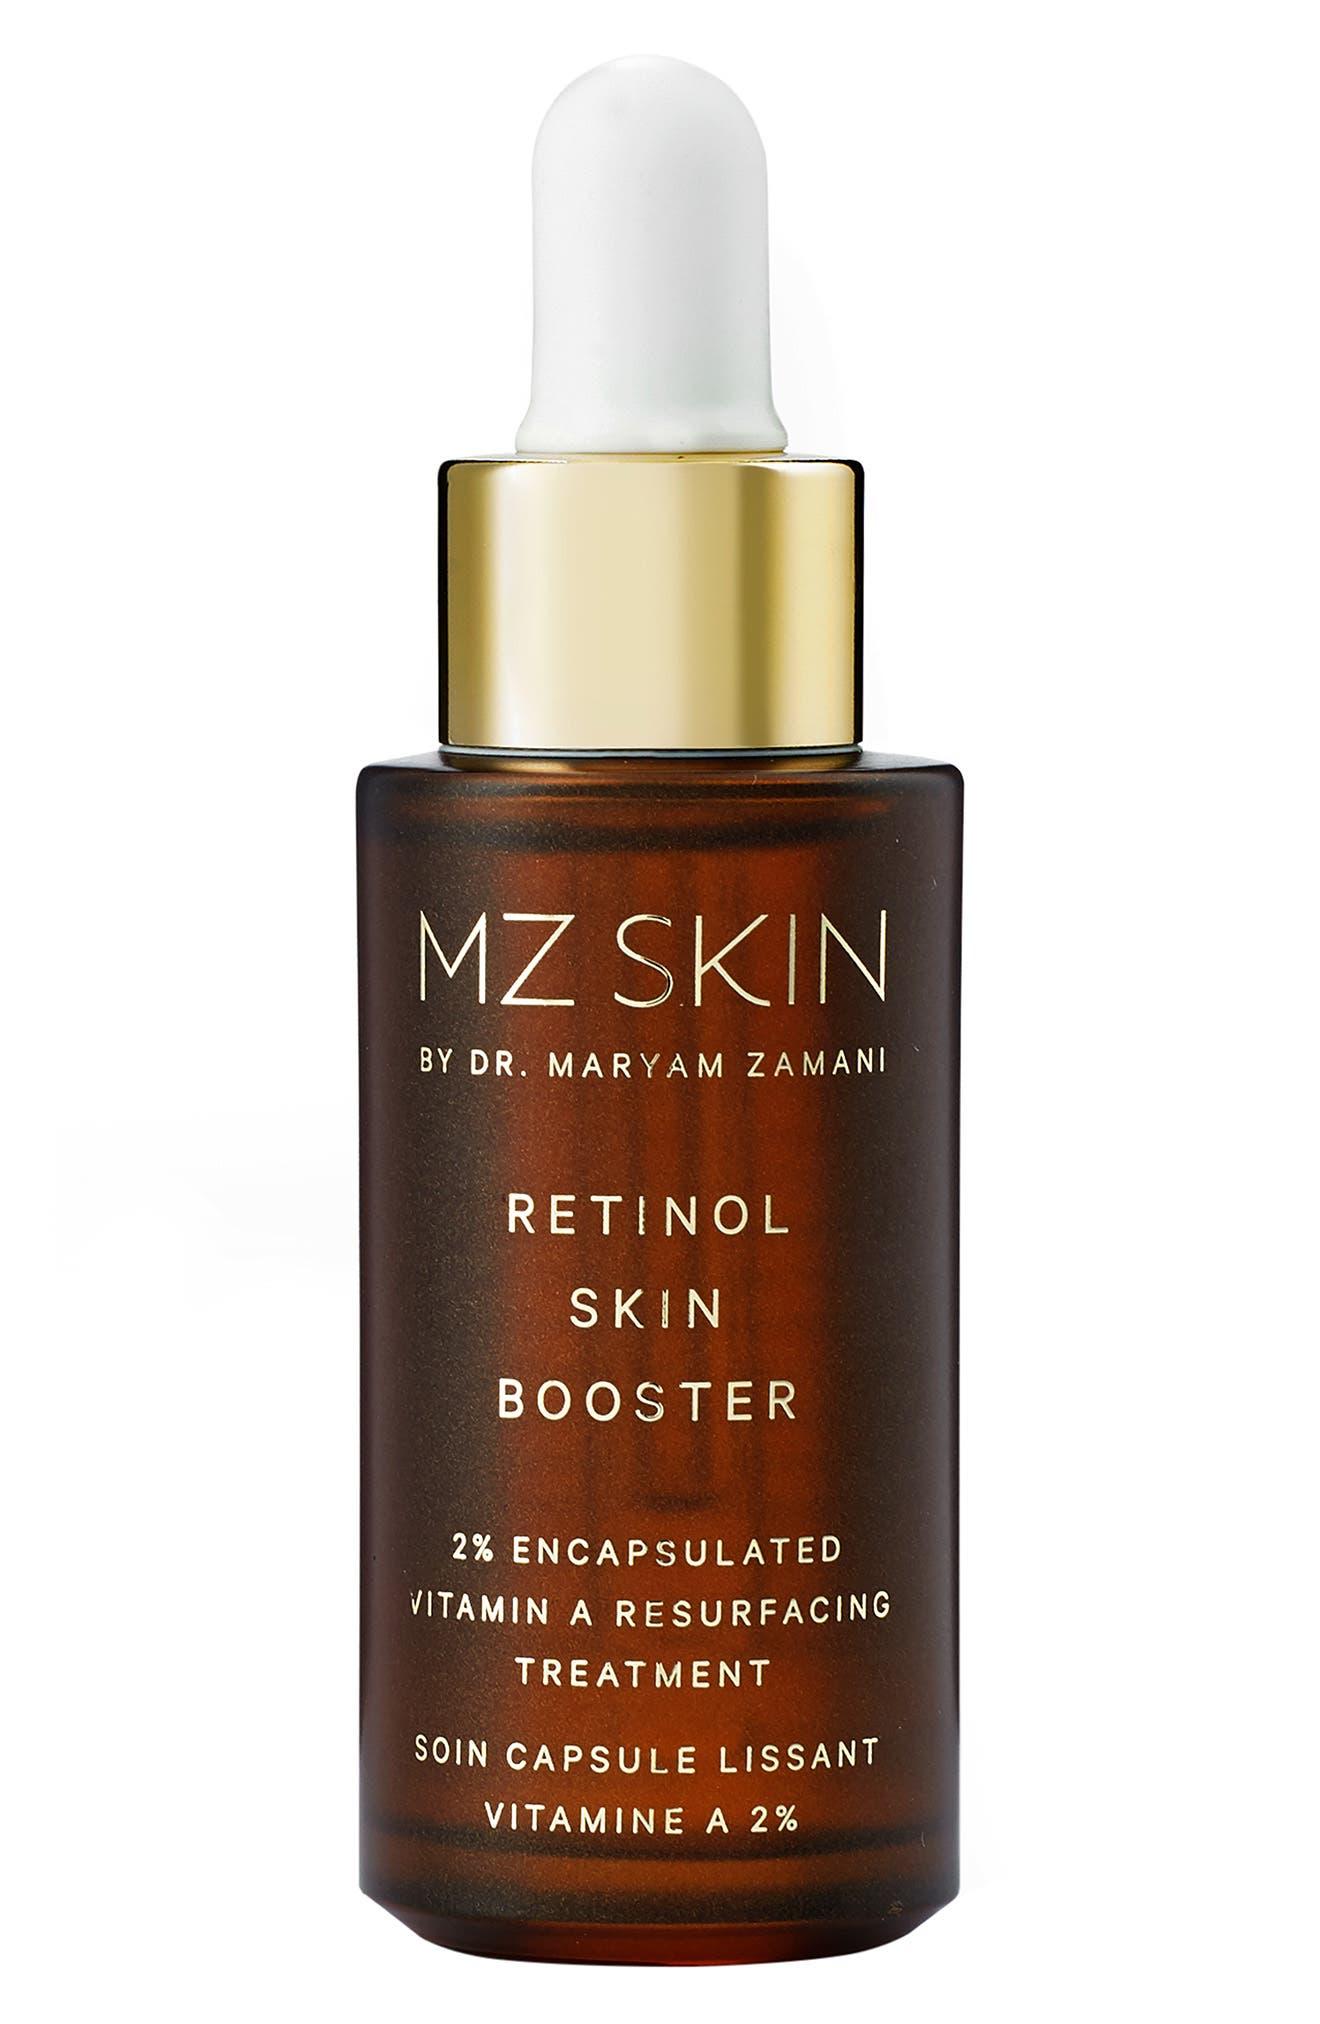 Retinol Skin Booster 2% Encapsulated Vitamin A Resurfacing Treatment